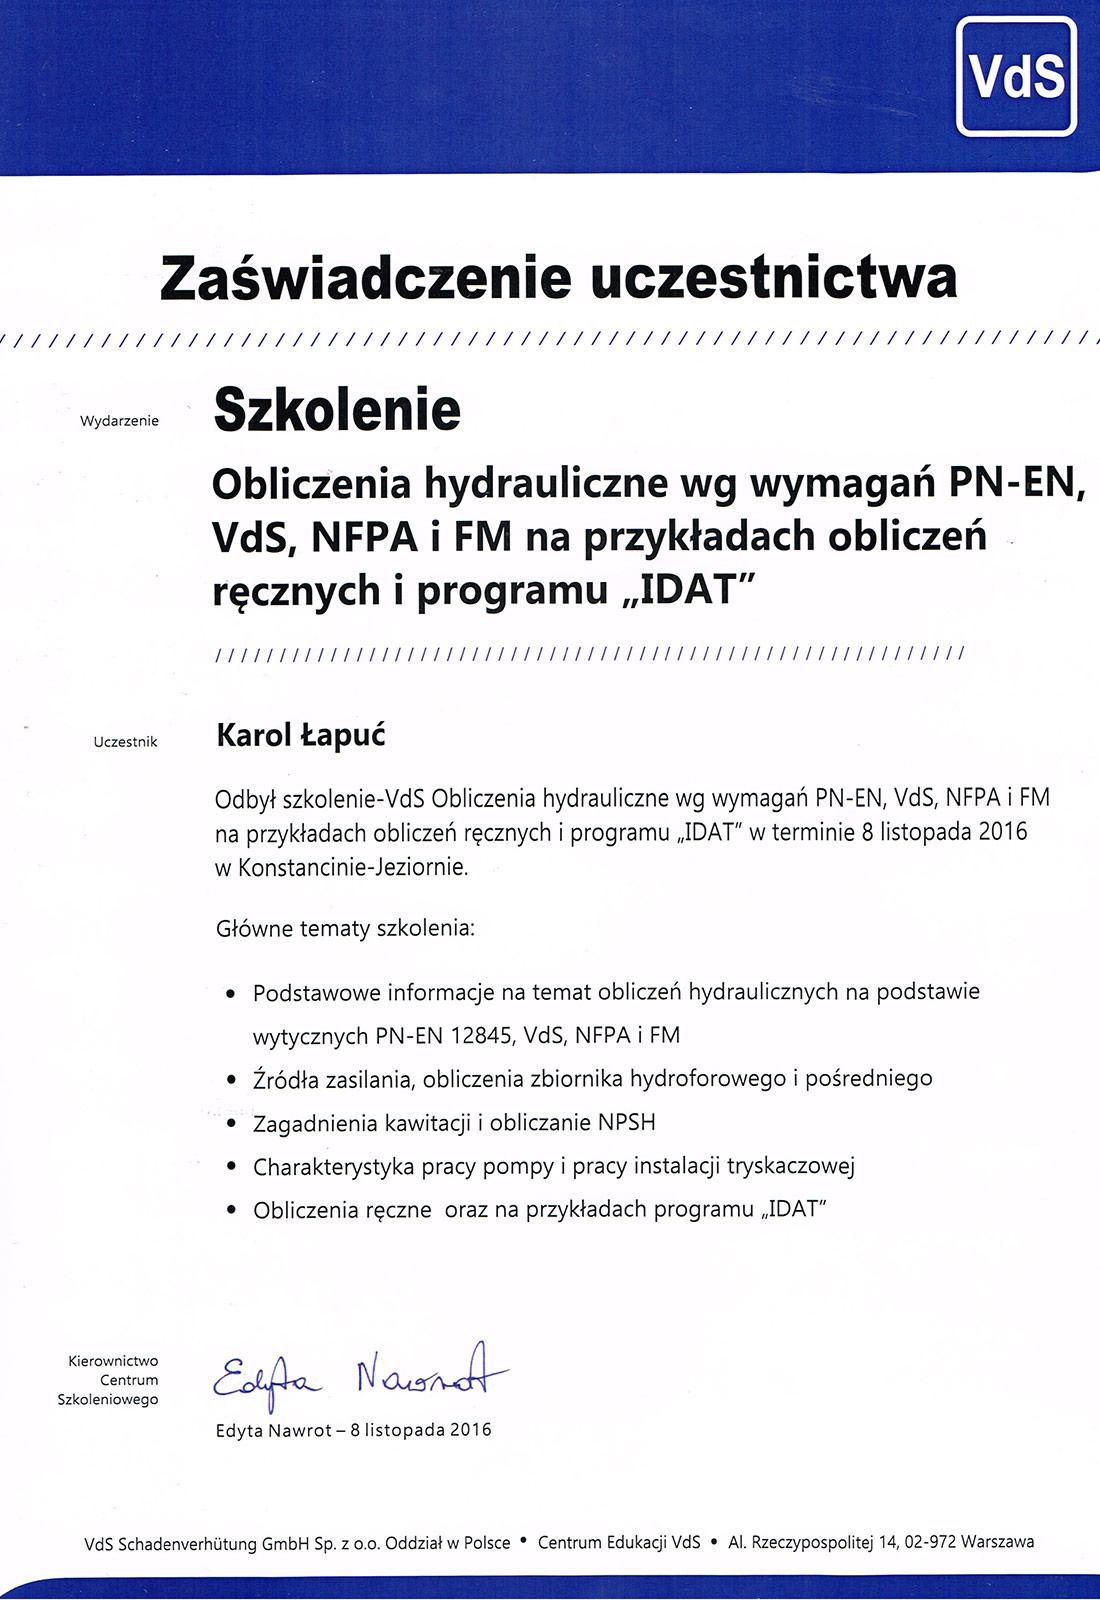 certyfikaty_ccf20170110_0002